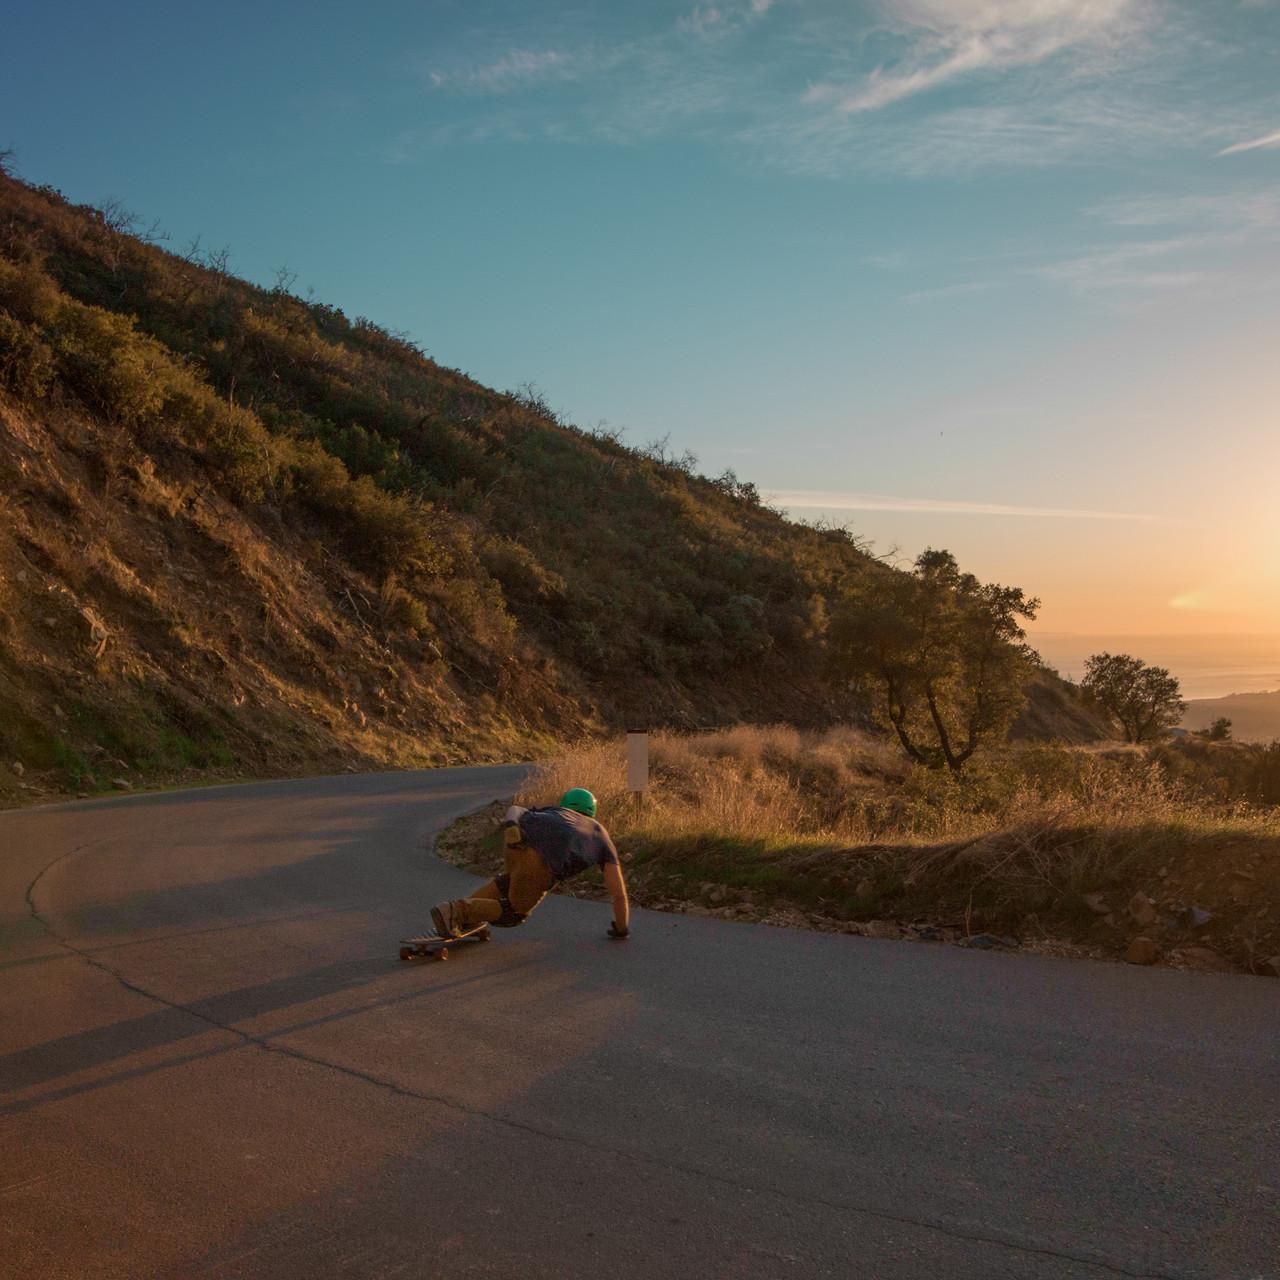 Grayson at Sunset